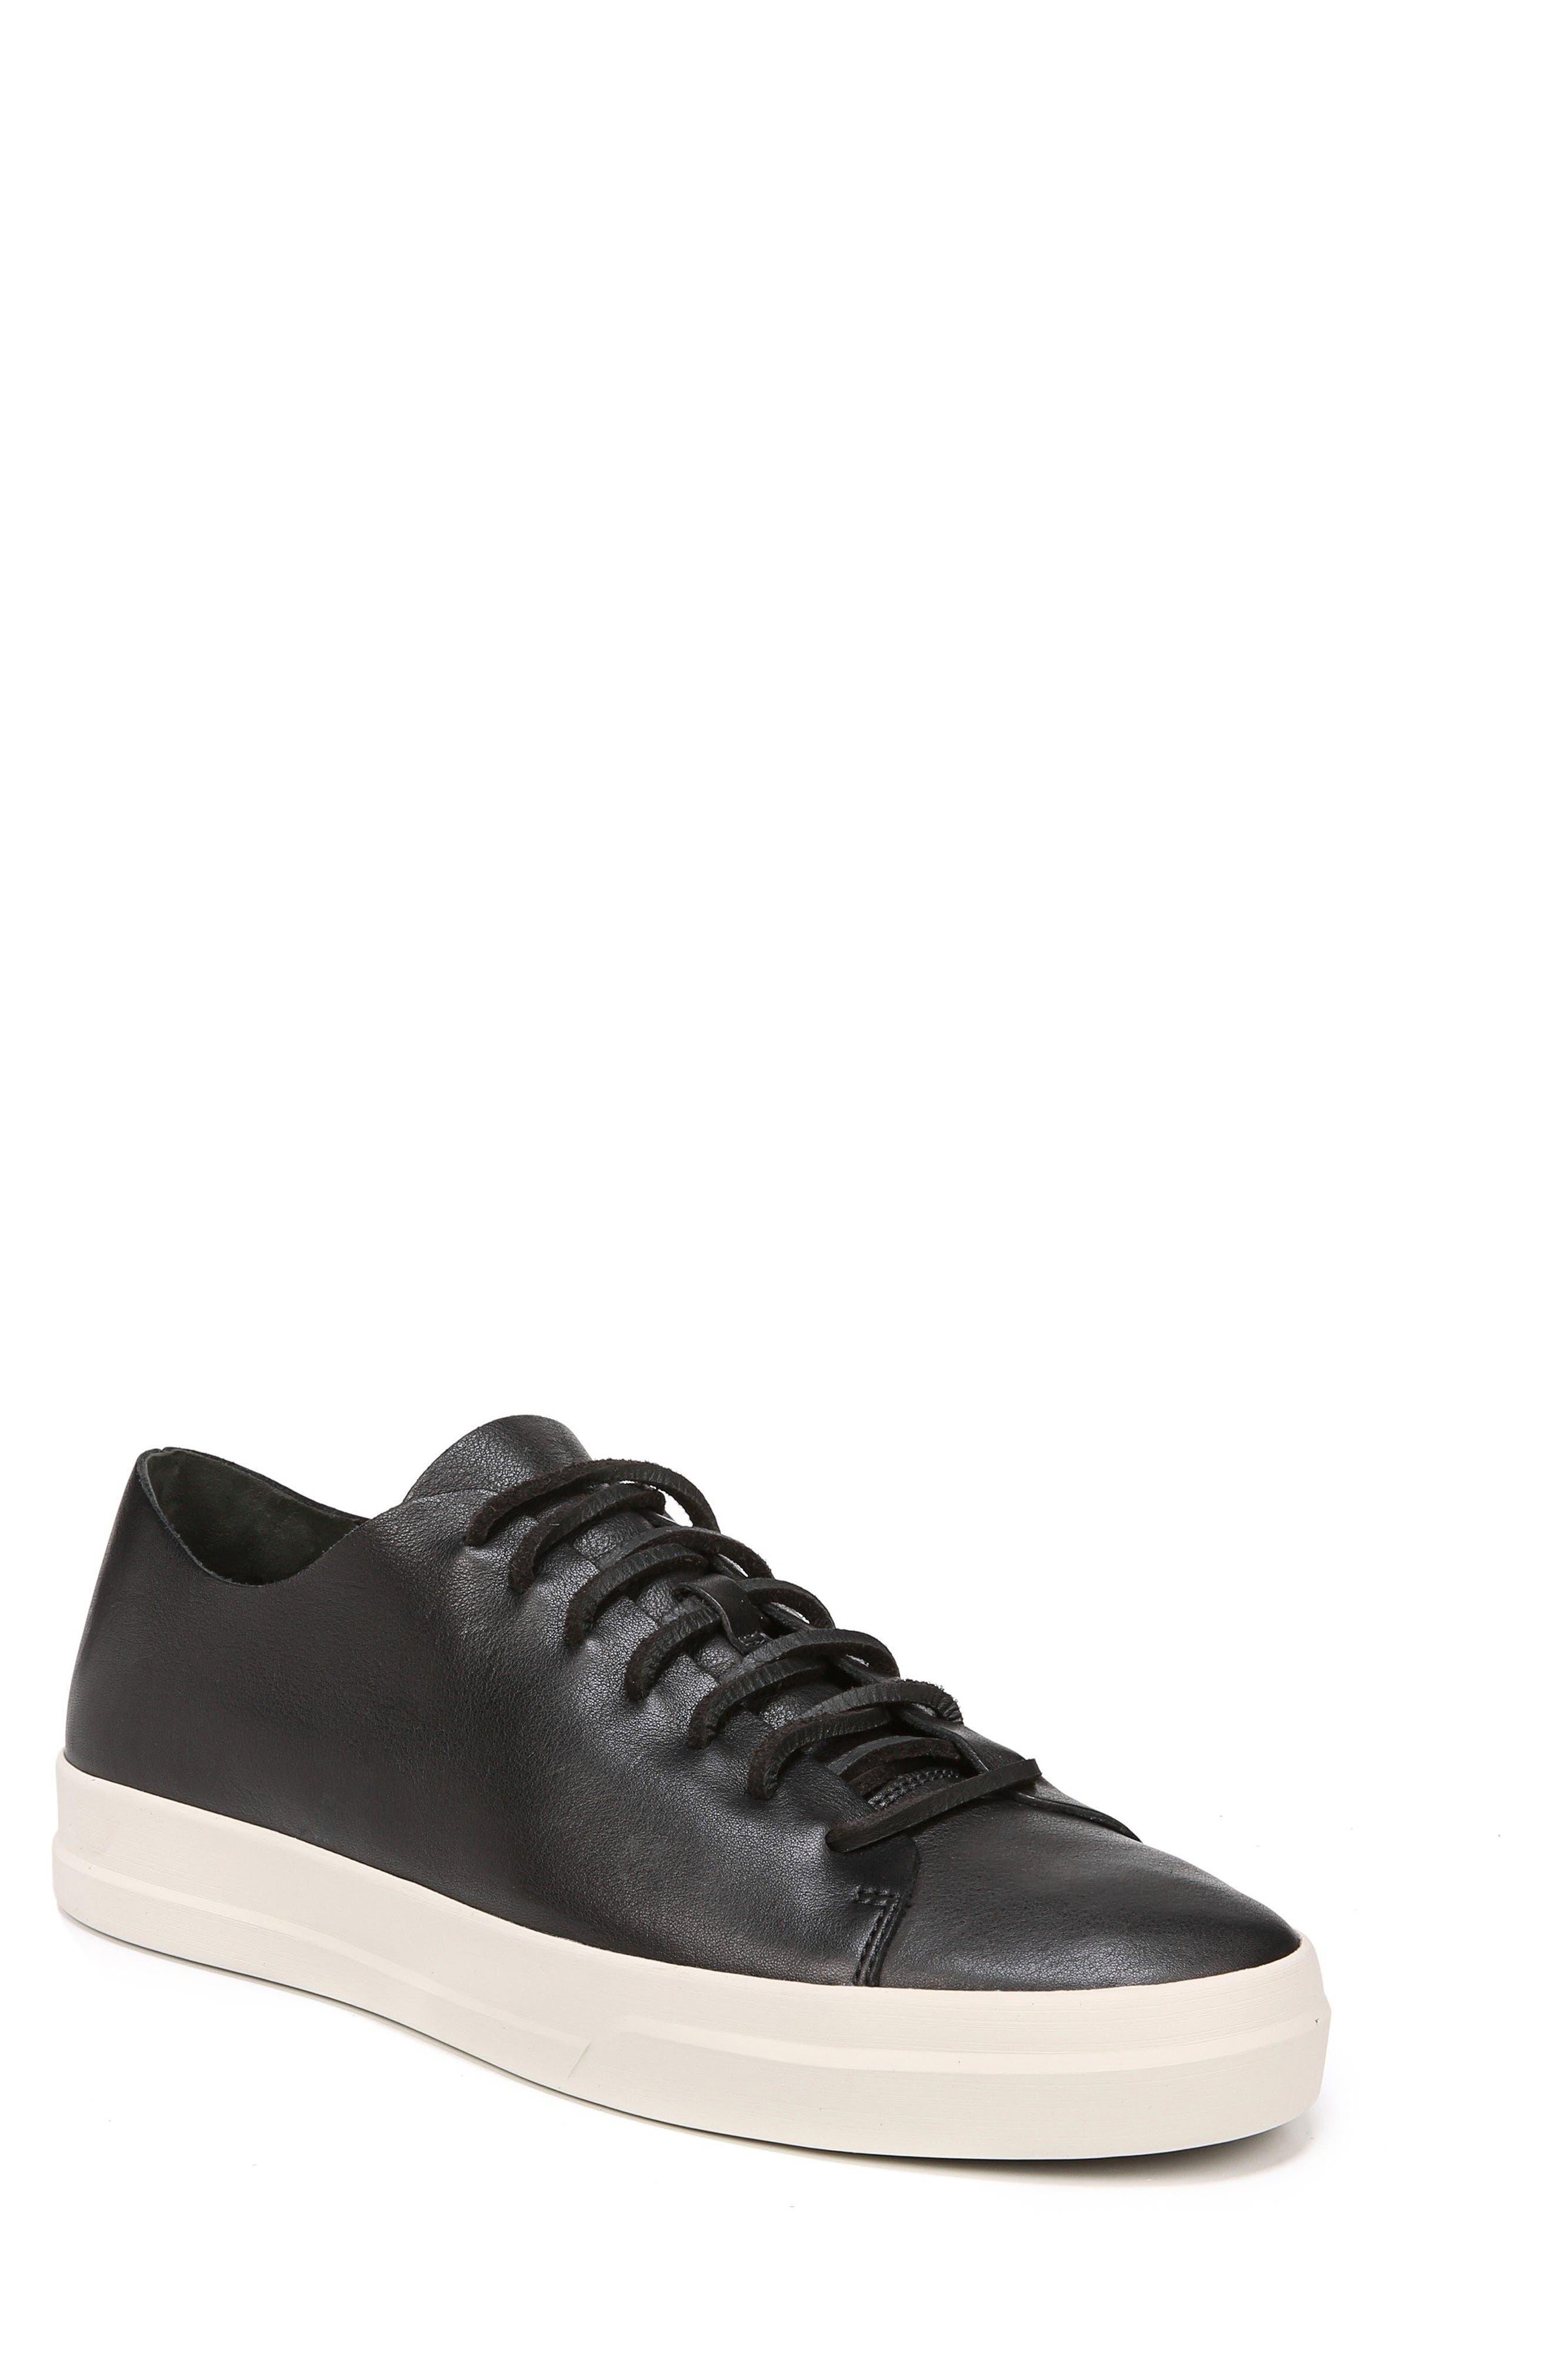 Copeland Sneaker,                             Main thumbnail 1, color,                             BLACK